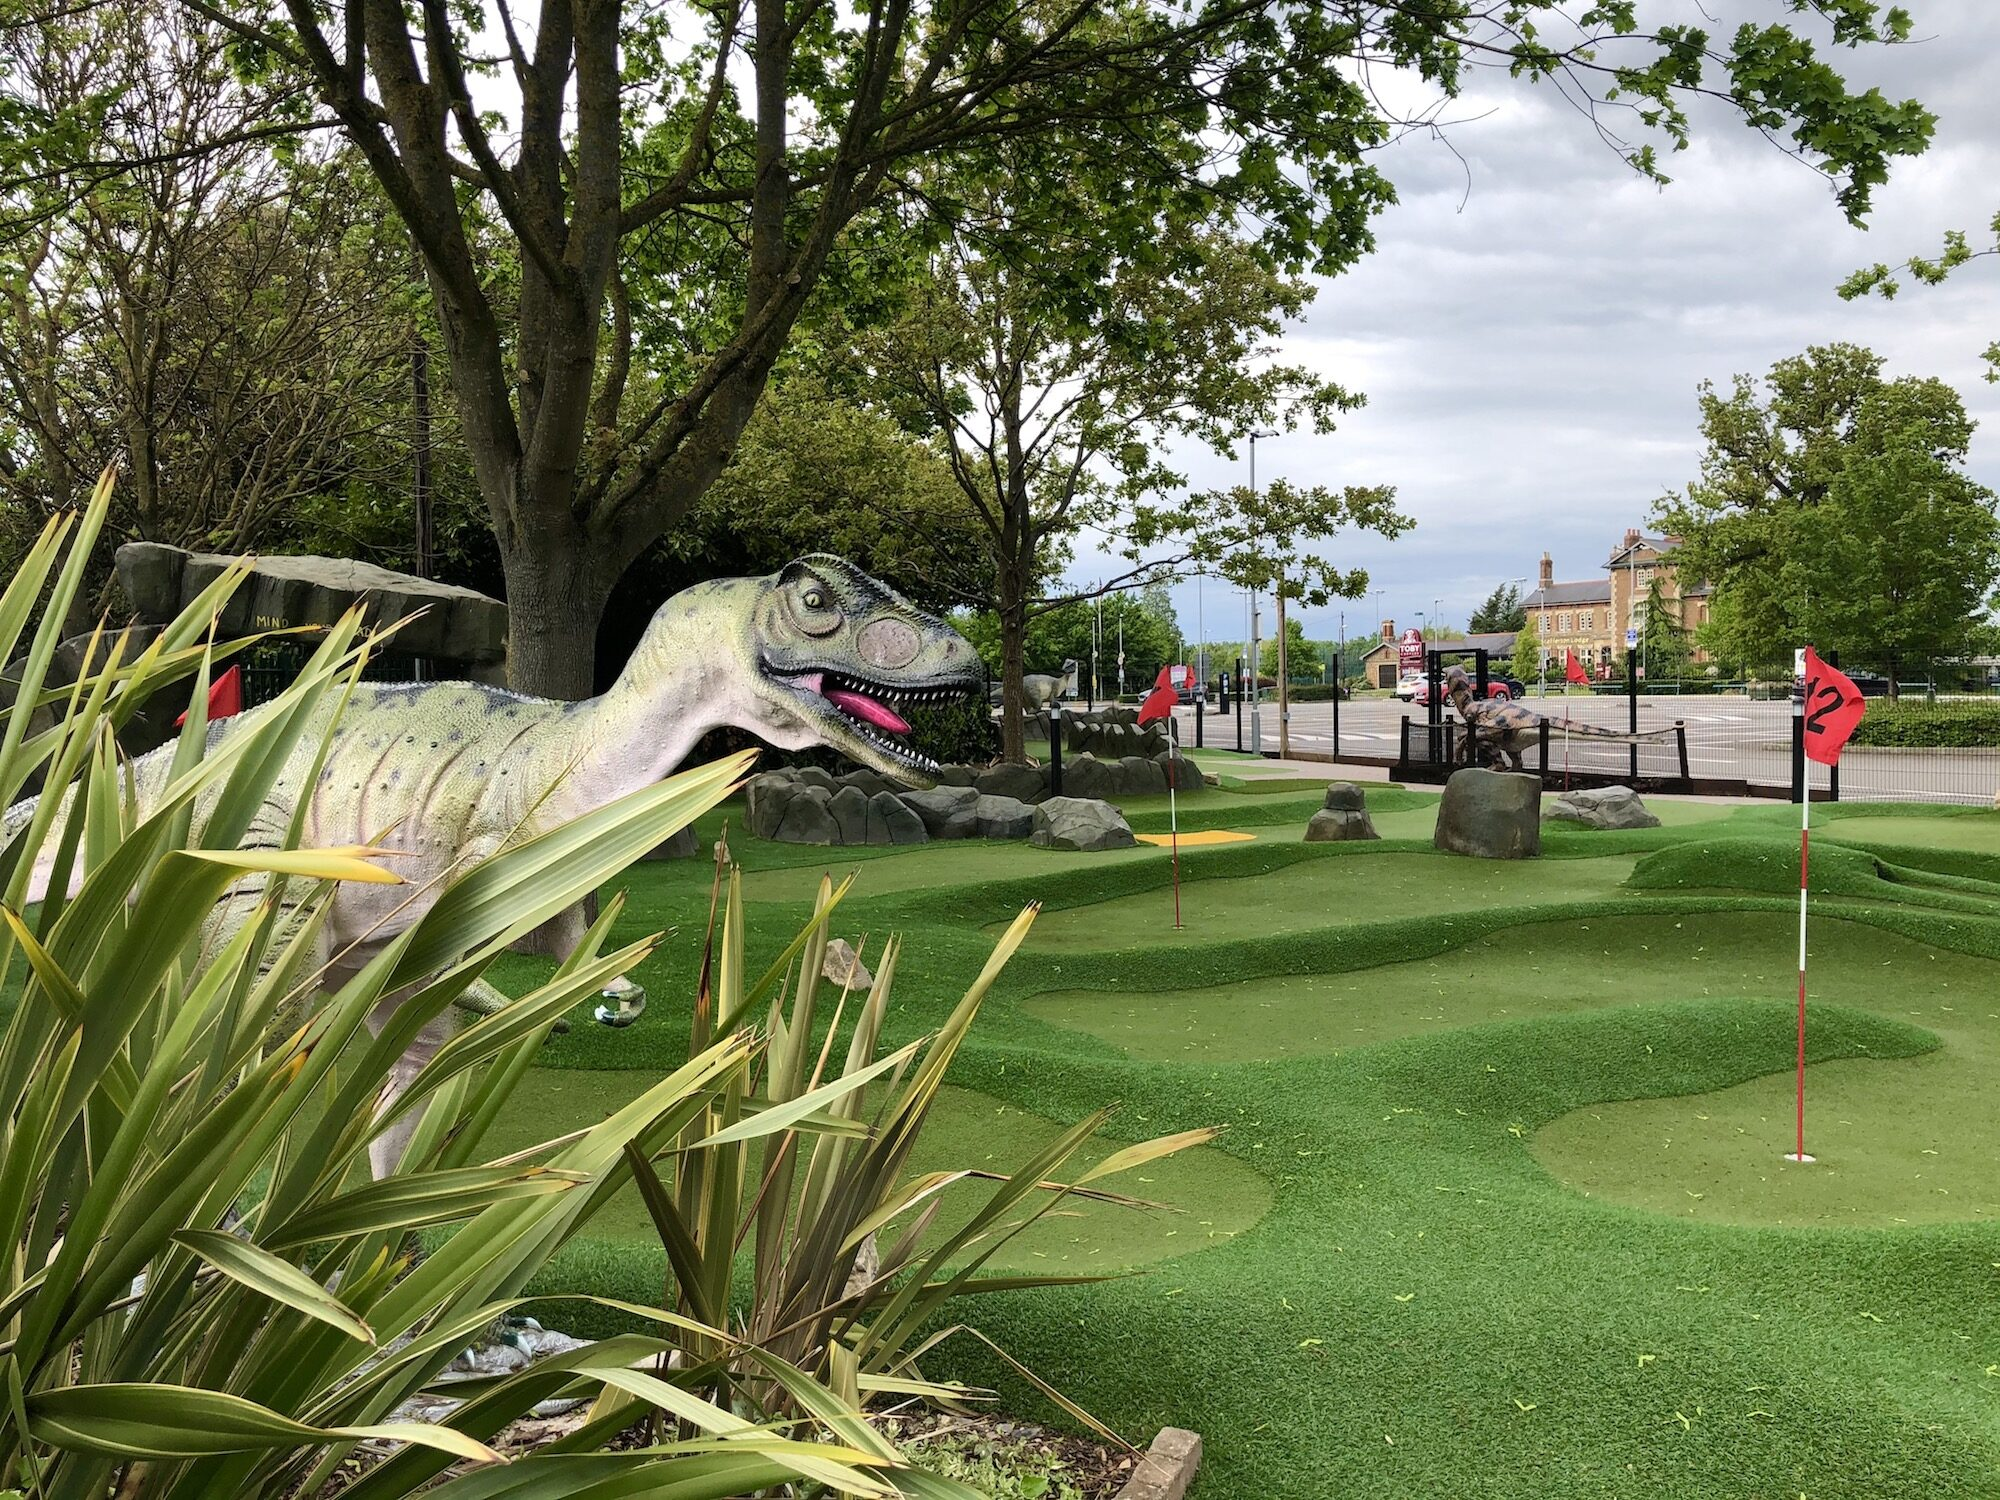 Maidenhead Mini-Golf Dinosaur fun for the entire family